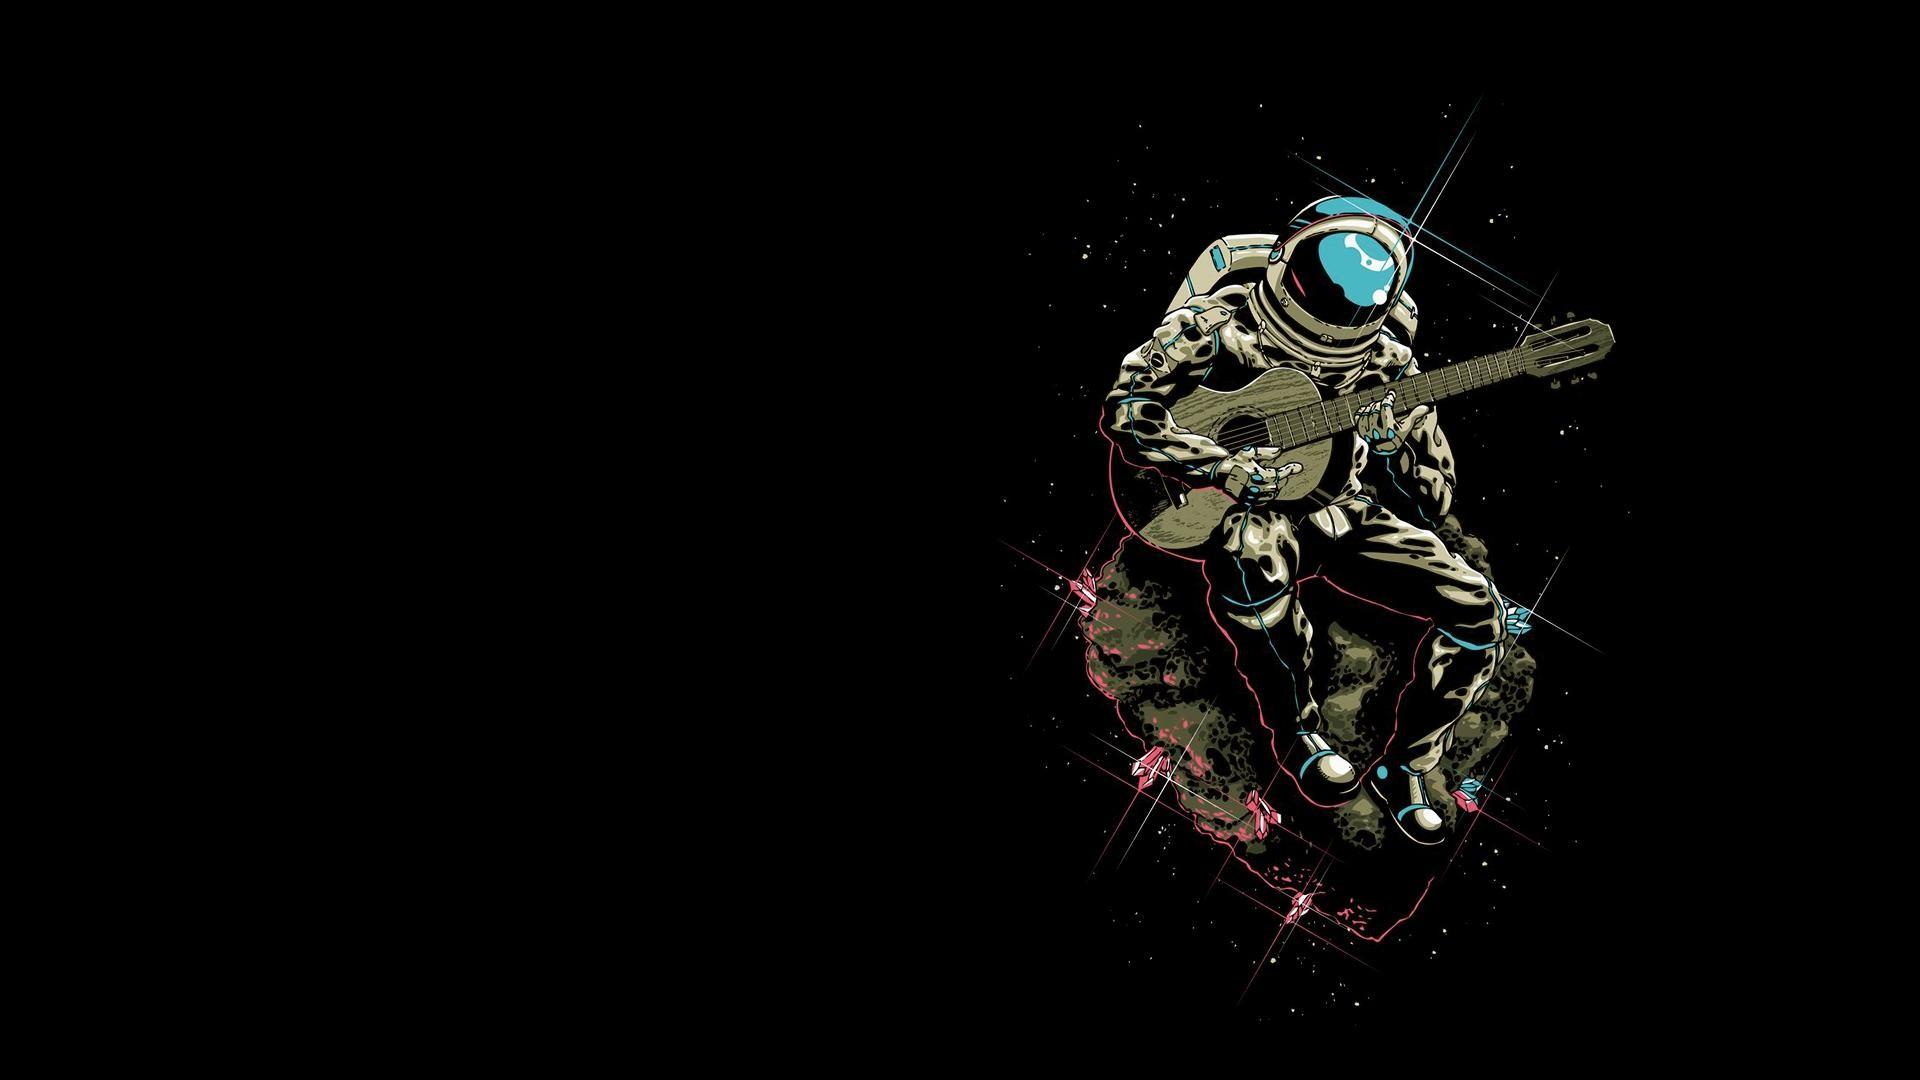 wallpaper.wiki-Astronaut-HD-Wallpaper-PIC-WPD003842-1